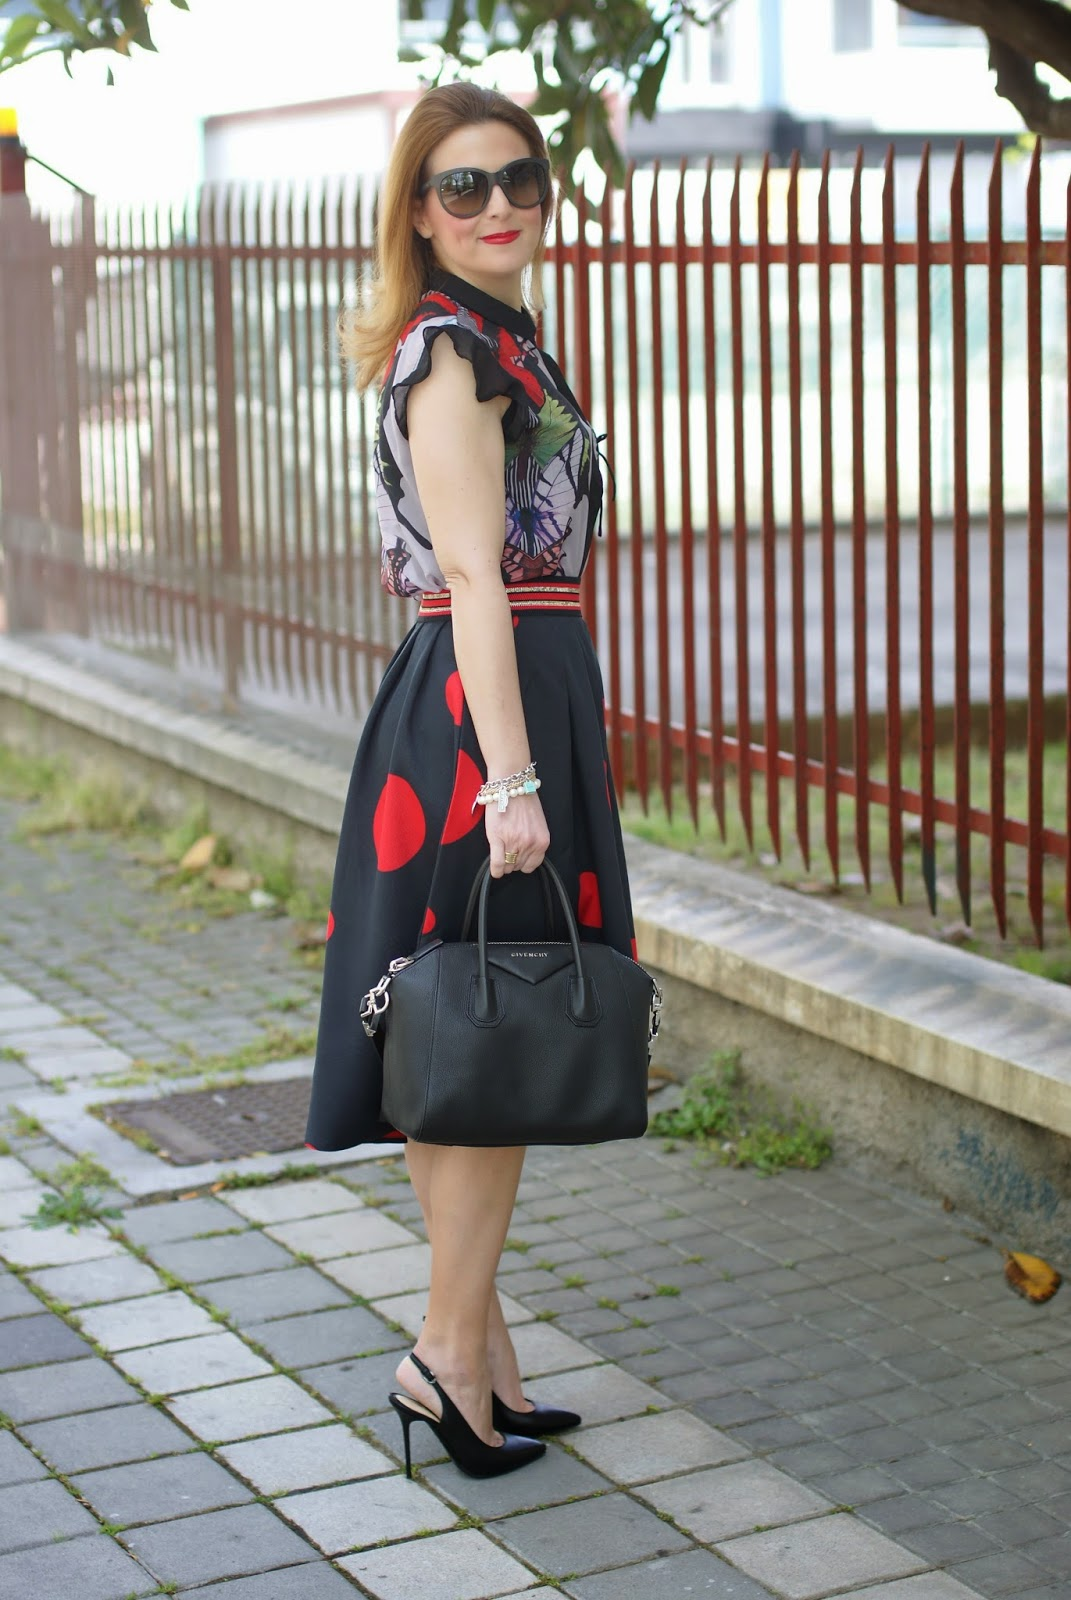 Smash! Saura blouse, Zaful polka dot skirt, Michele Muzi shoes, large polka dot print, mix of prints on Fashion and Cookies fashion blog, fashion blogger style